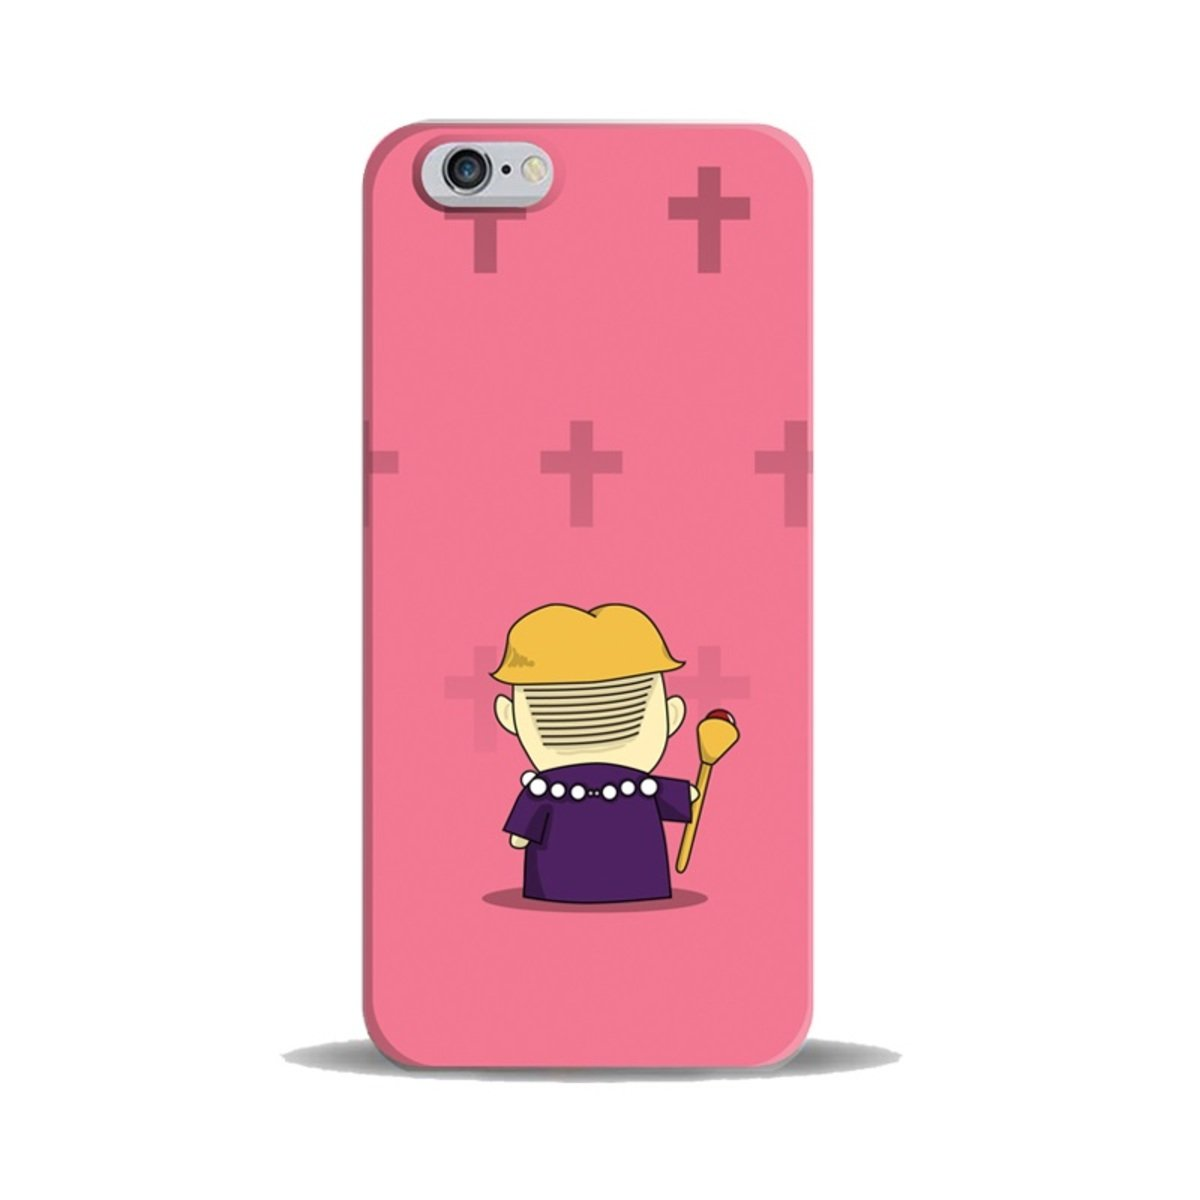 "iPhase - iPhone 6 (4.7"") 手機膠殼電話保護套 4.7寸 (God Father) (另有適合iPhone 6 Plus 5.5寸型號)"